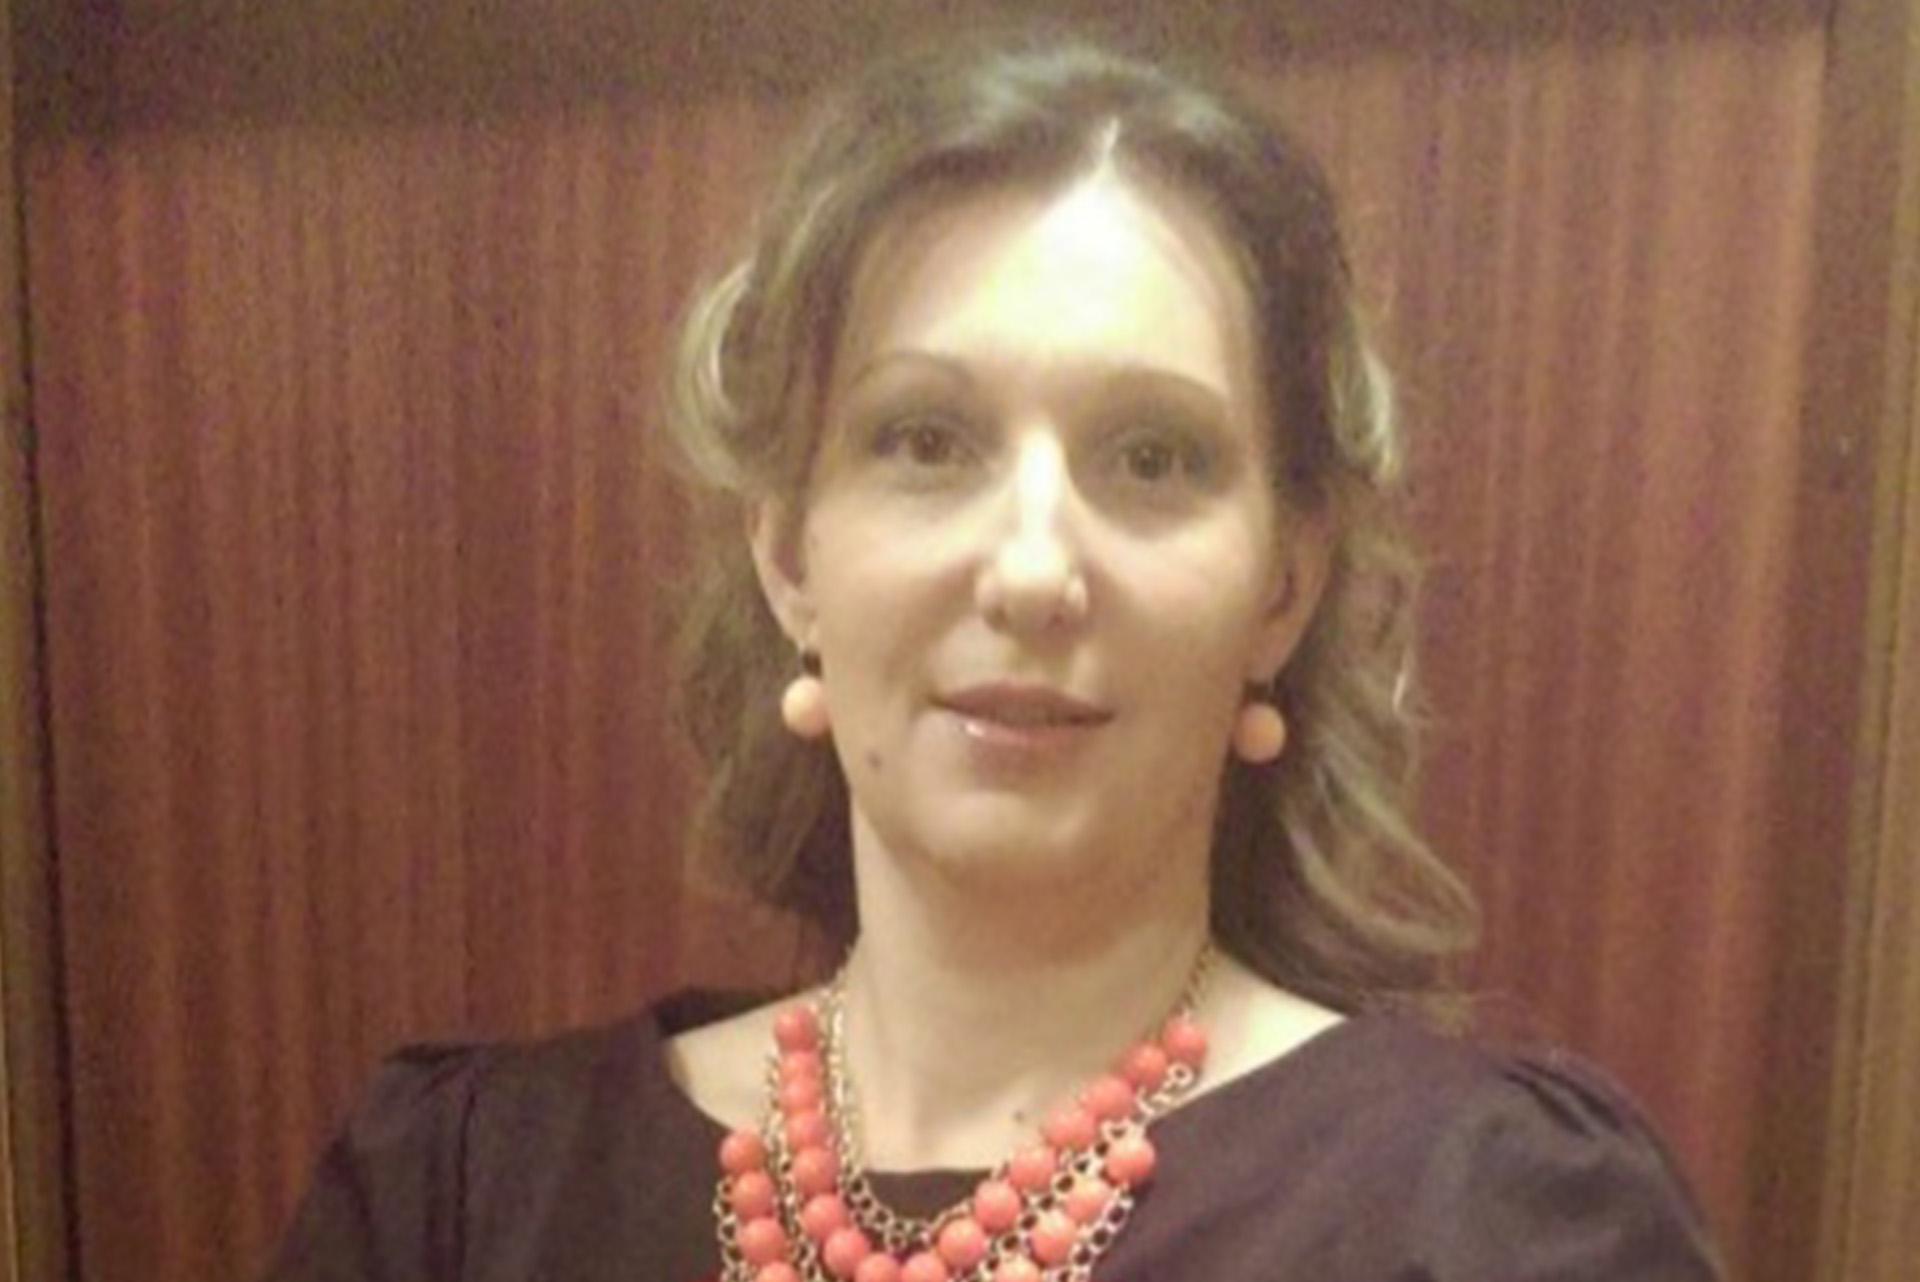 https://brankoradicevic.org.rs/wp-content/uploads/2019/03/Mirjana-Bosic-Zivanovic.jpg